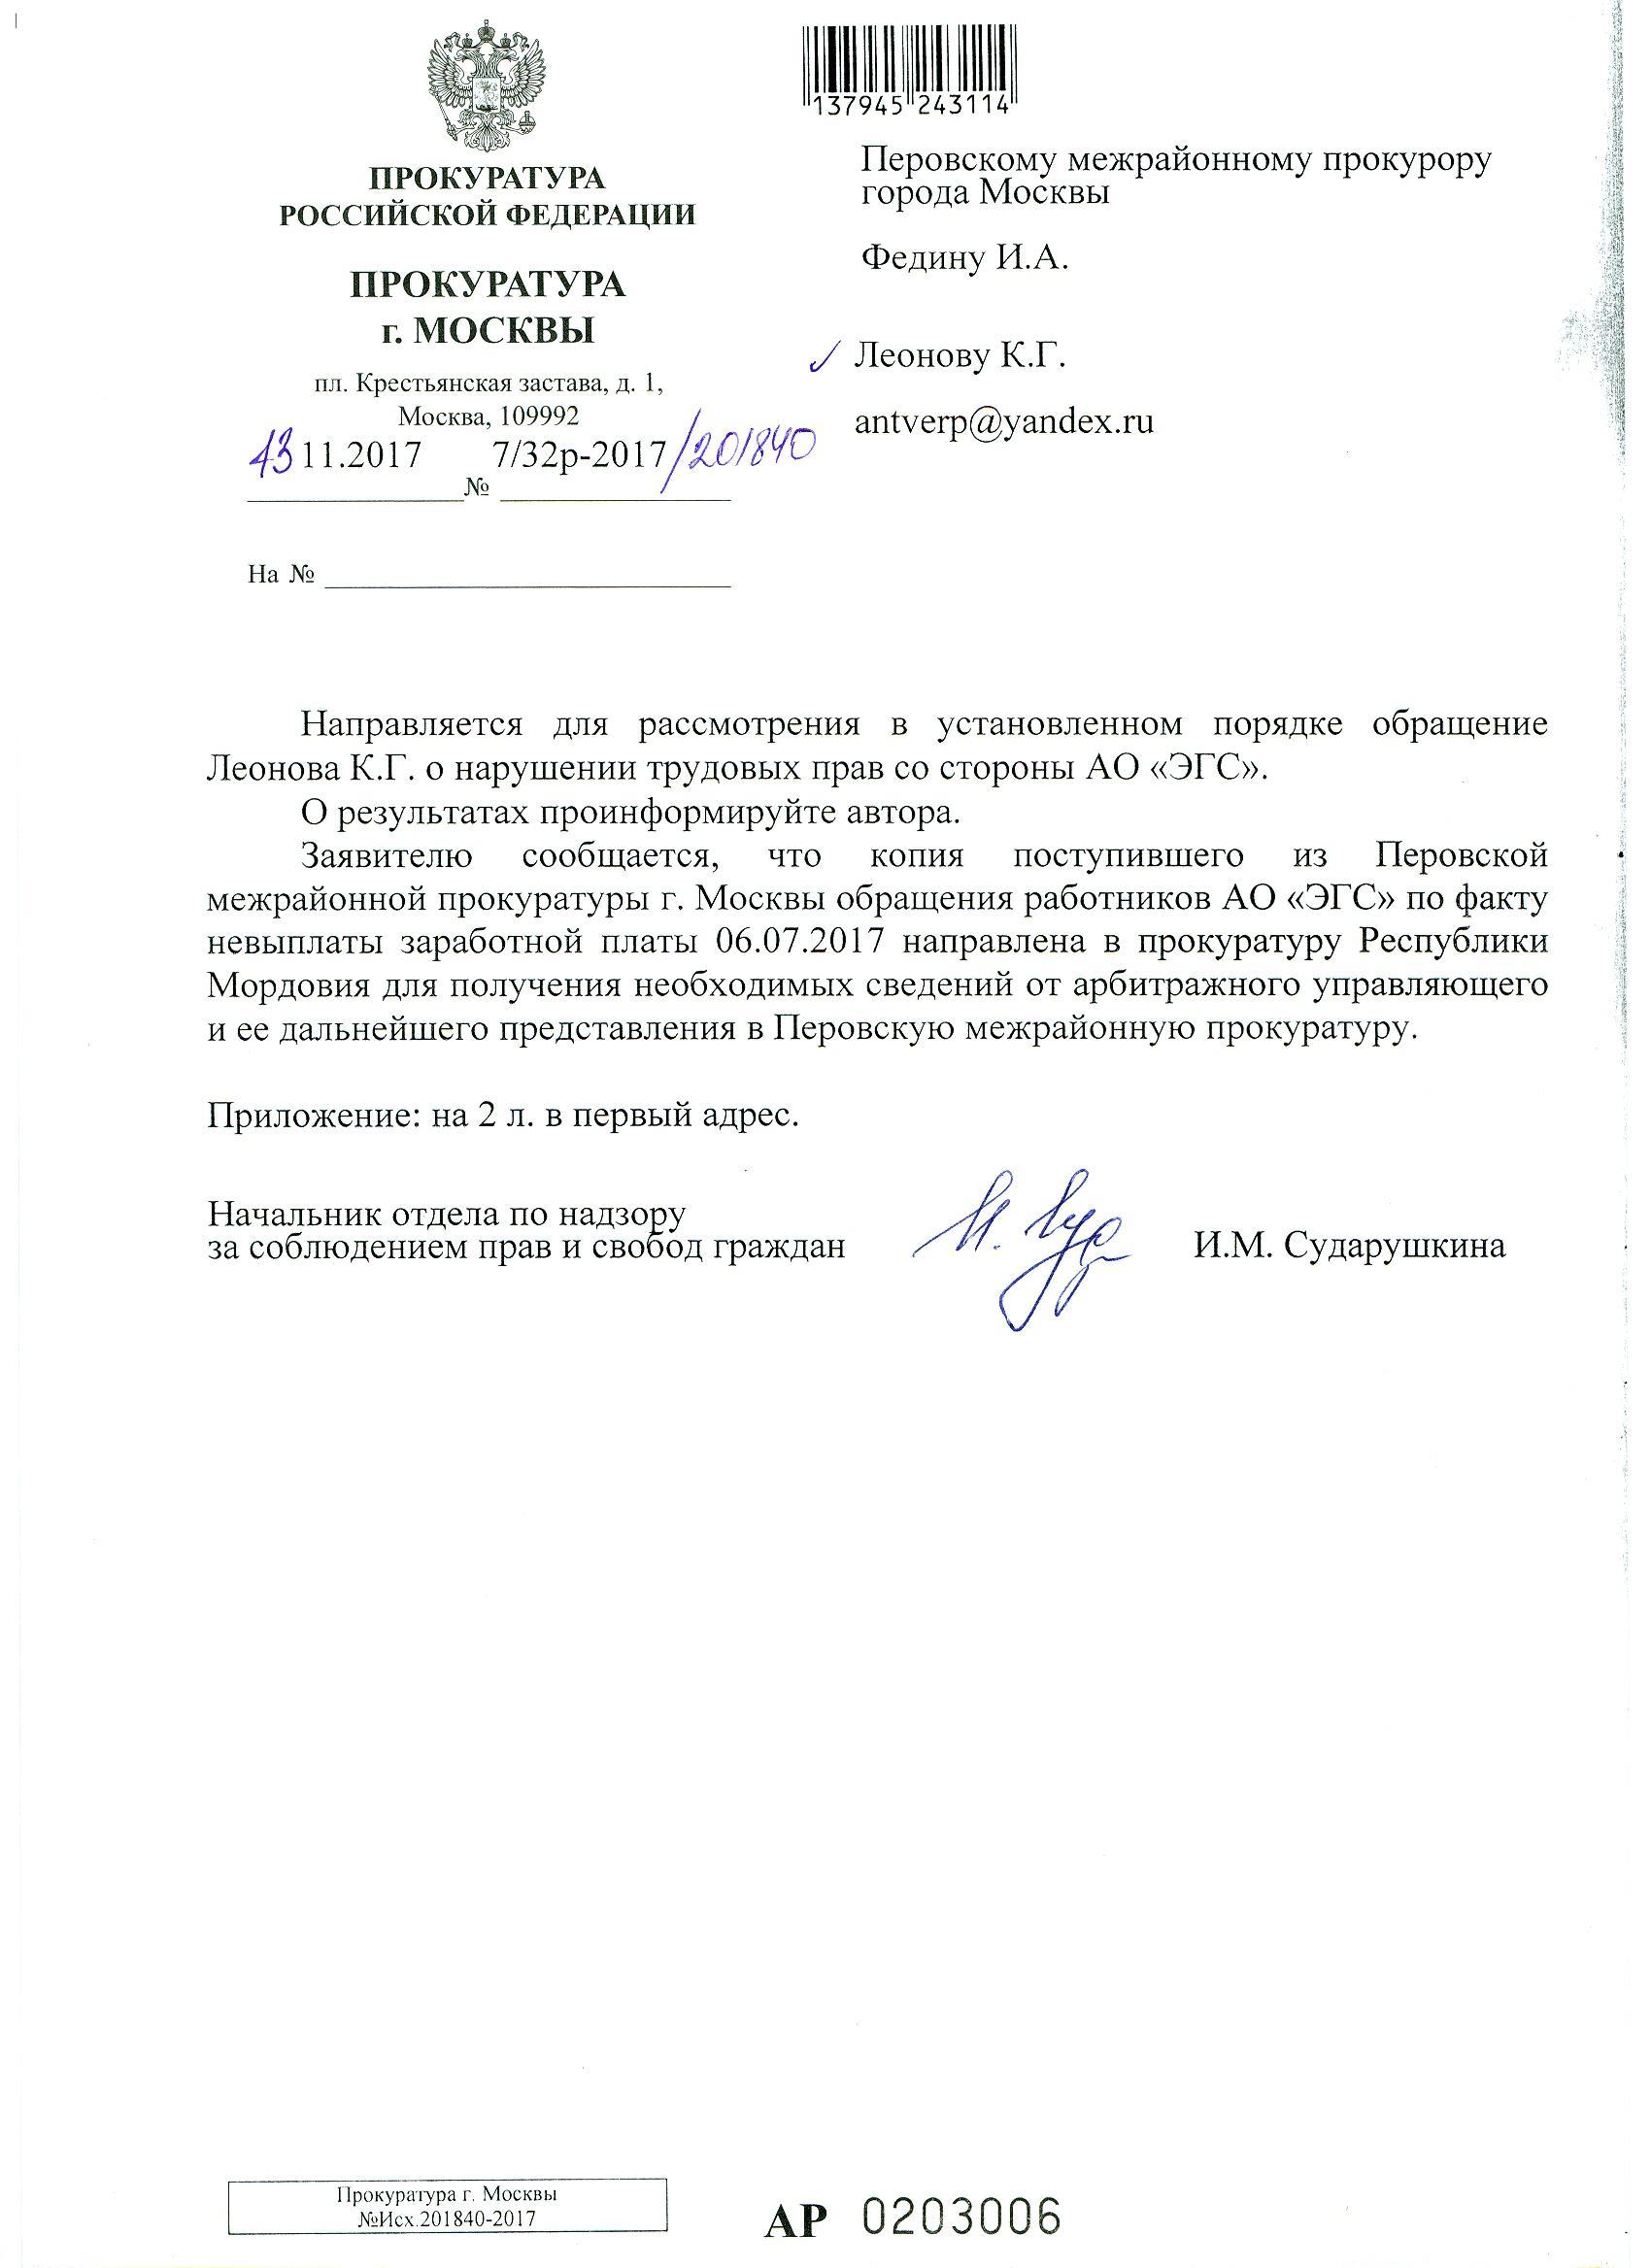 Письмо президенту адрес